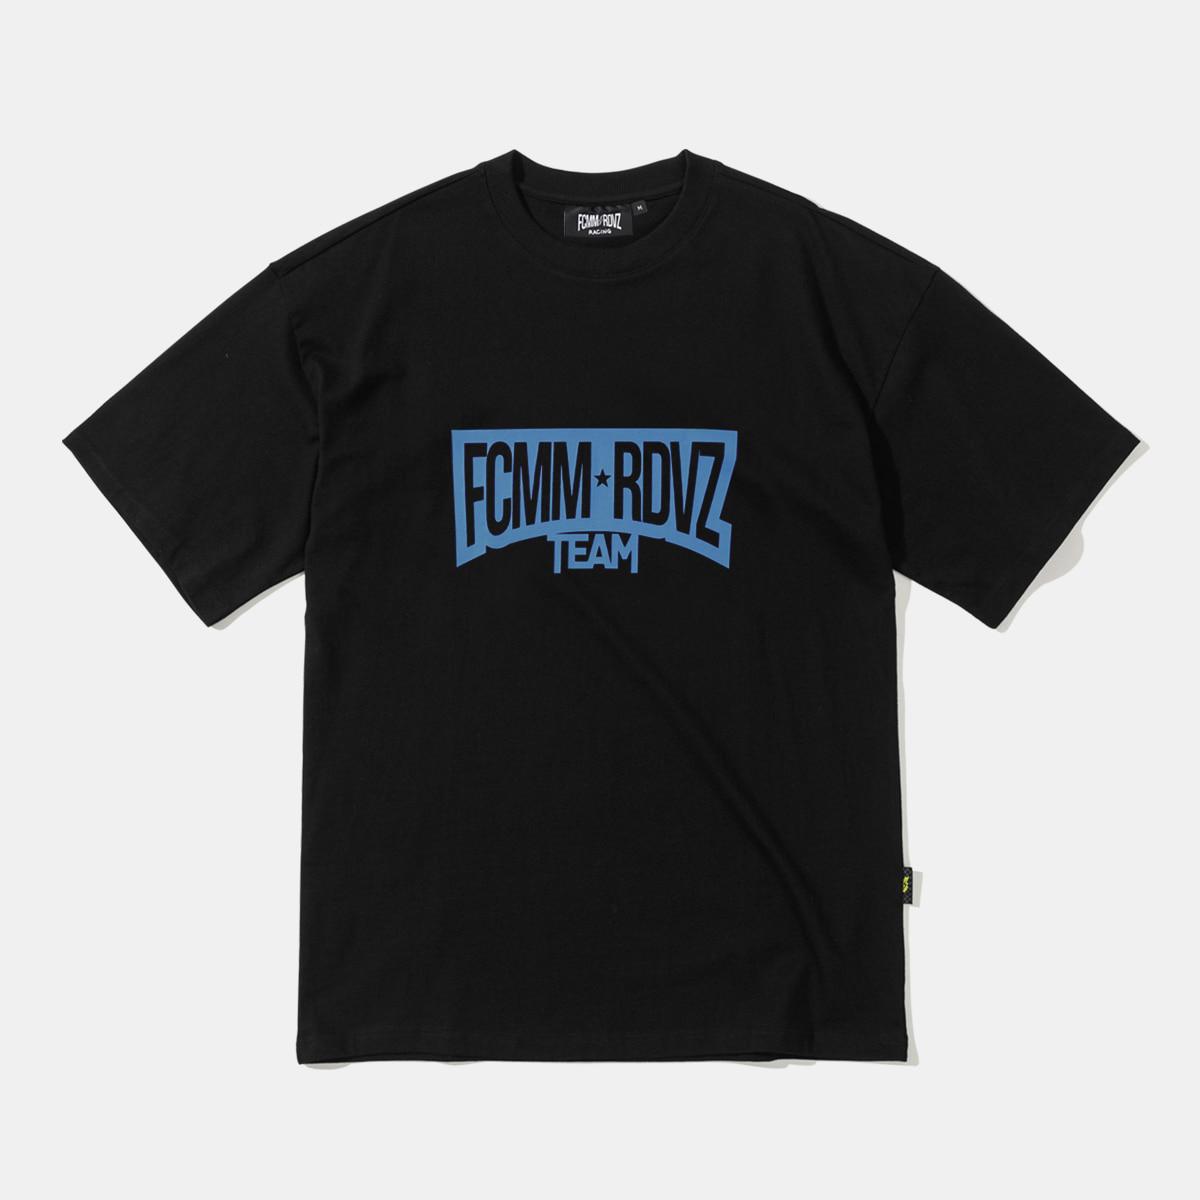 FCMM X RDVZ 레이싱 팀 티셔츠 - 블랙